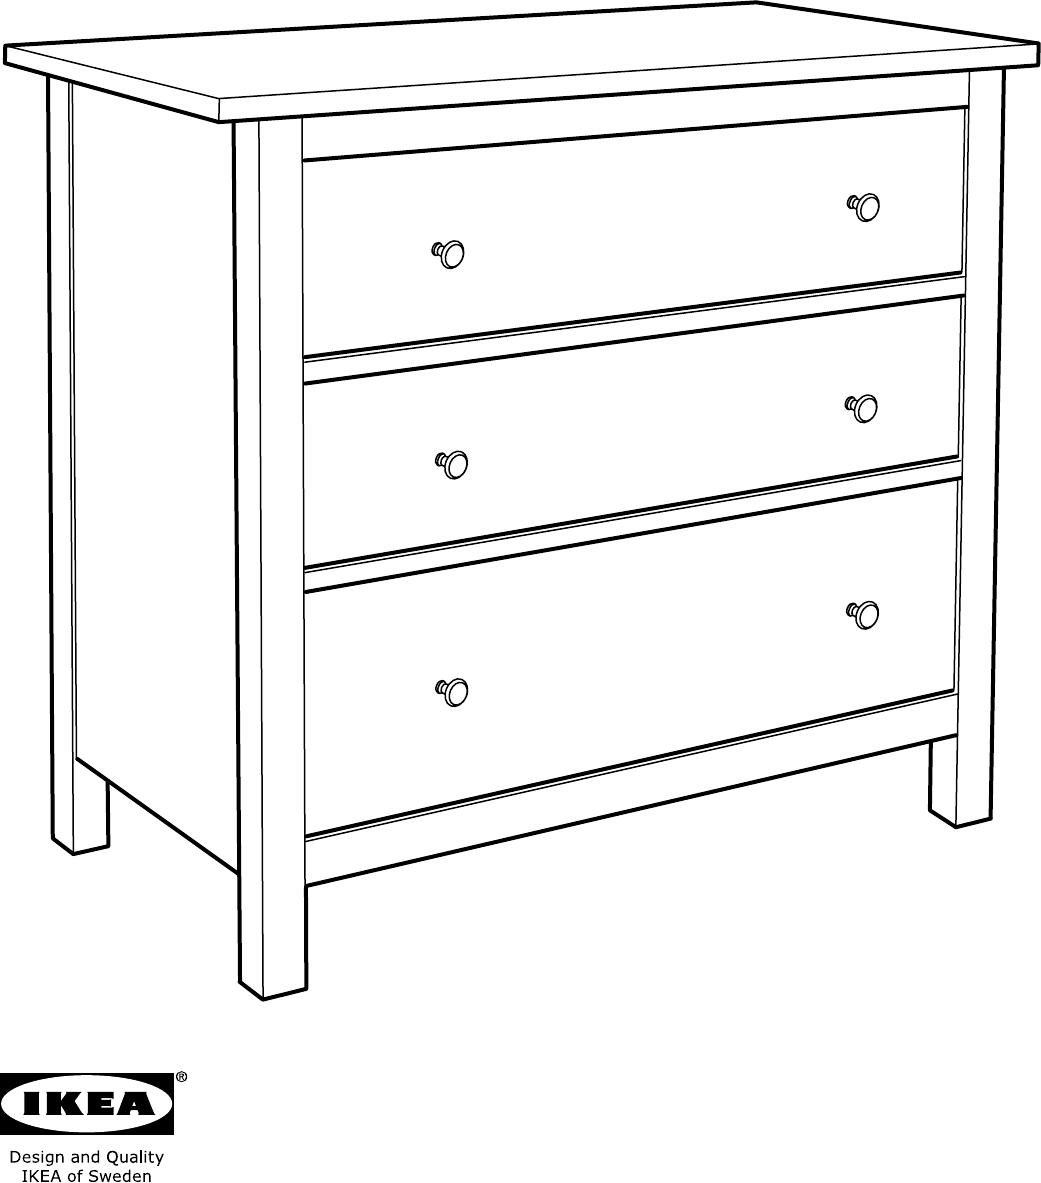 Hemnes Ladekast Met 8 Laden.Handleiding Ikea Hemnes Ladekast 3 Lades Pagina 1 Van 20 Dansk